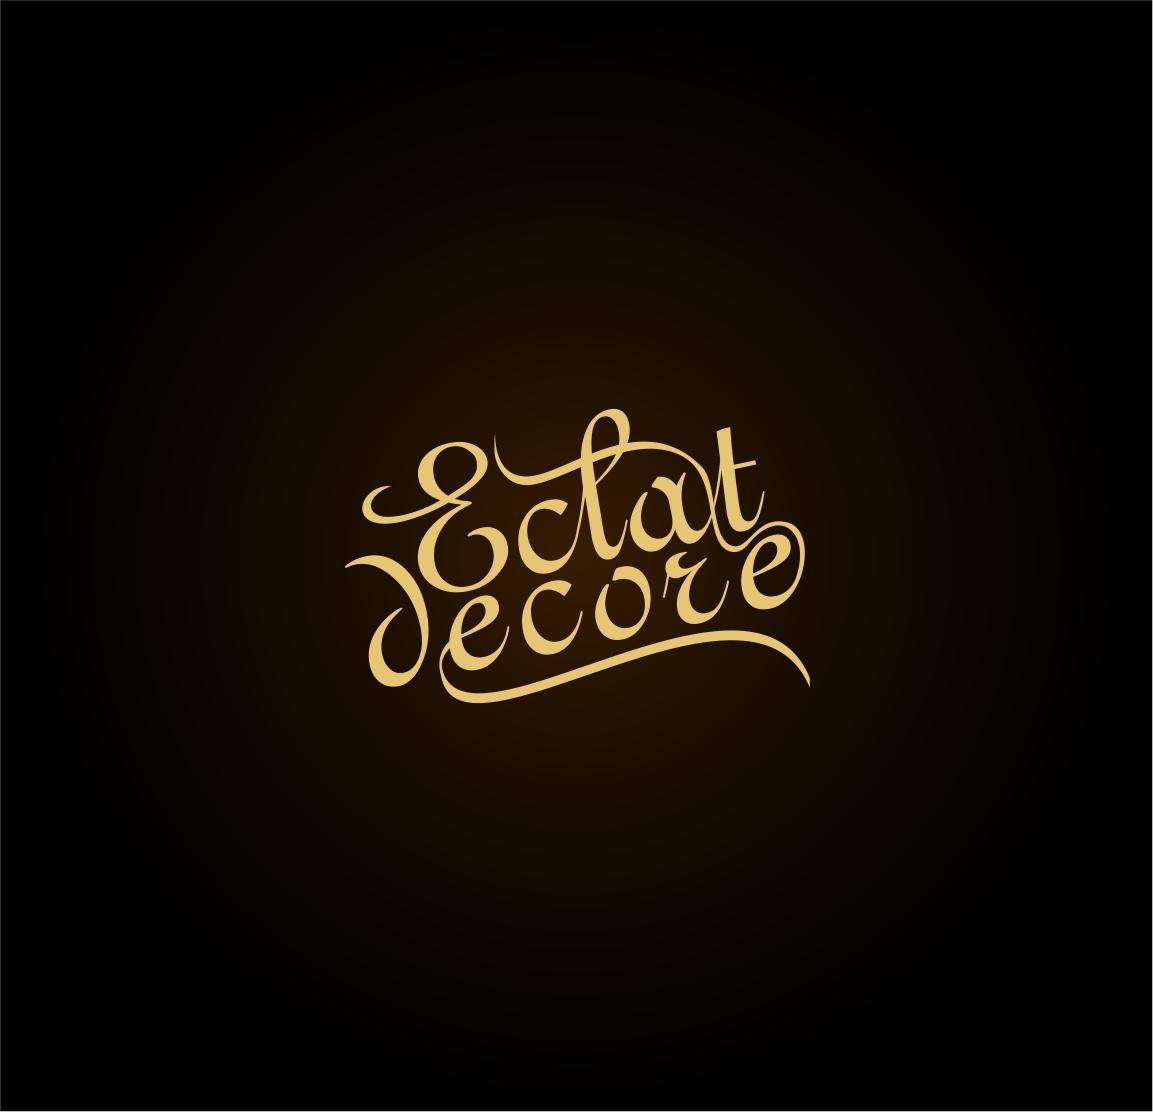 Logo Design by haidu - Entry No. 68 in the Logo Design Contest Imaginative Logo Design for Éclat Decor.